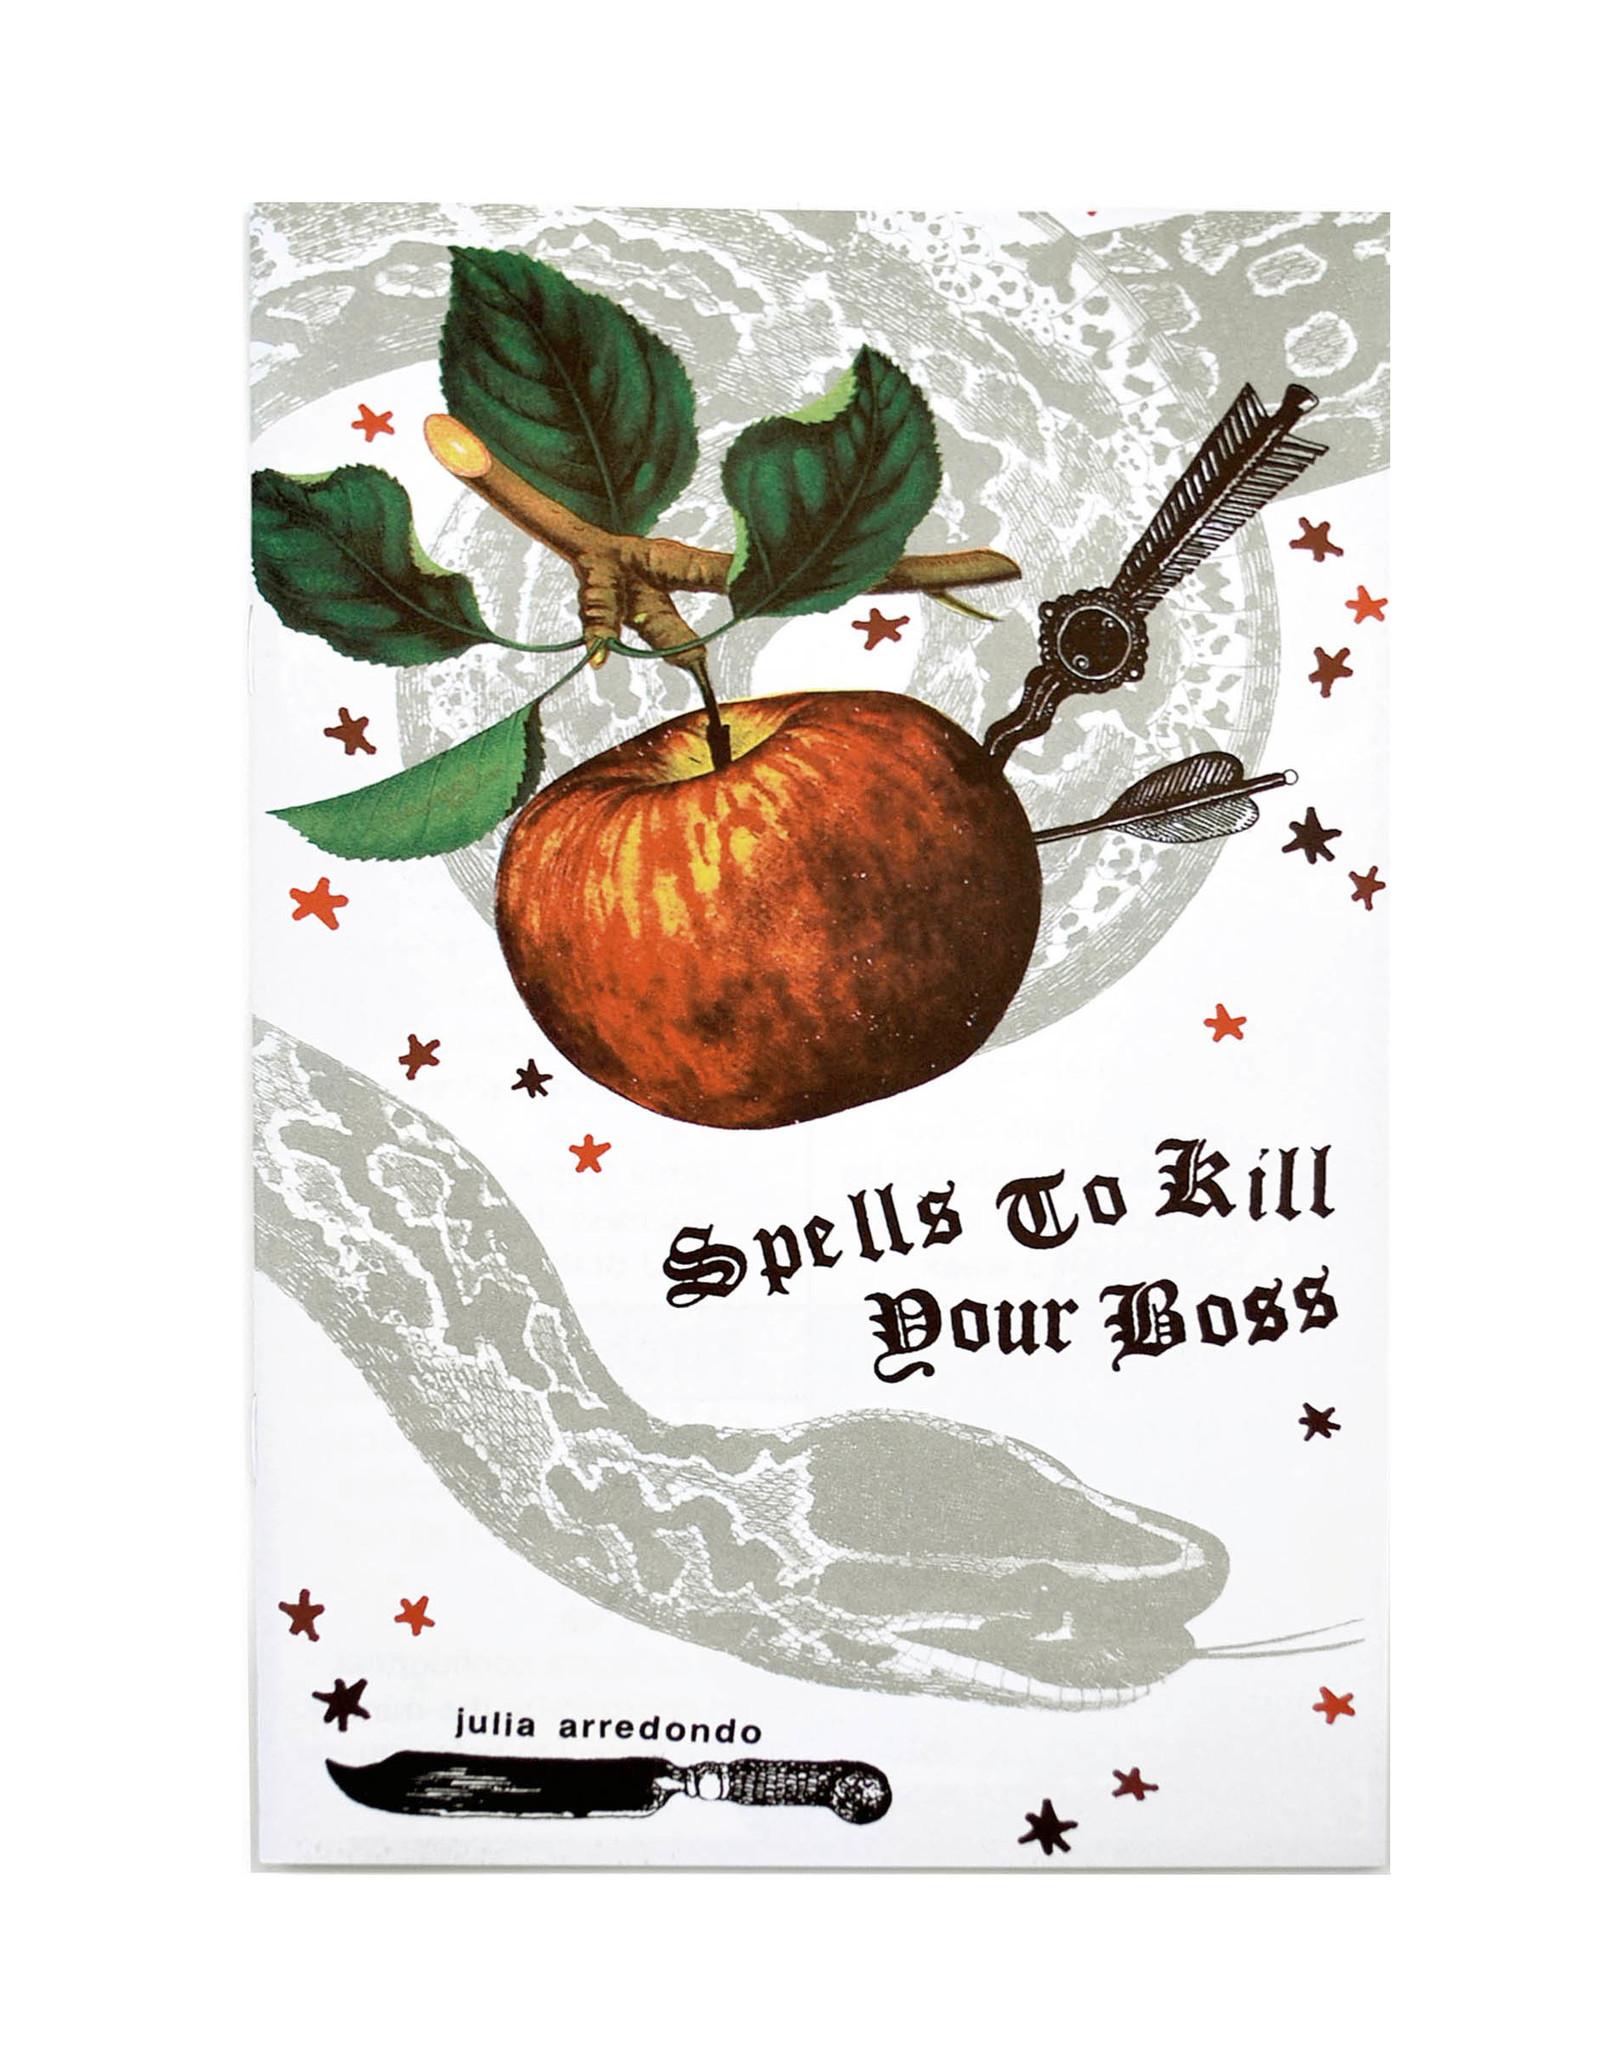 Julia Arredondo Spells To Kill Your Boss Zine by Julia Arredondo